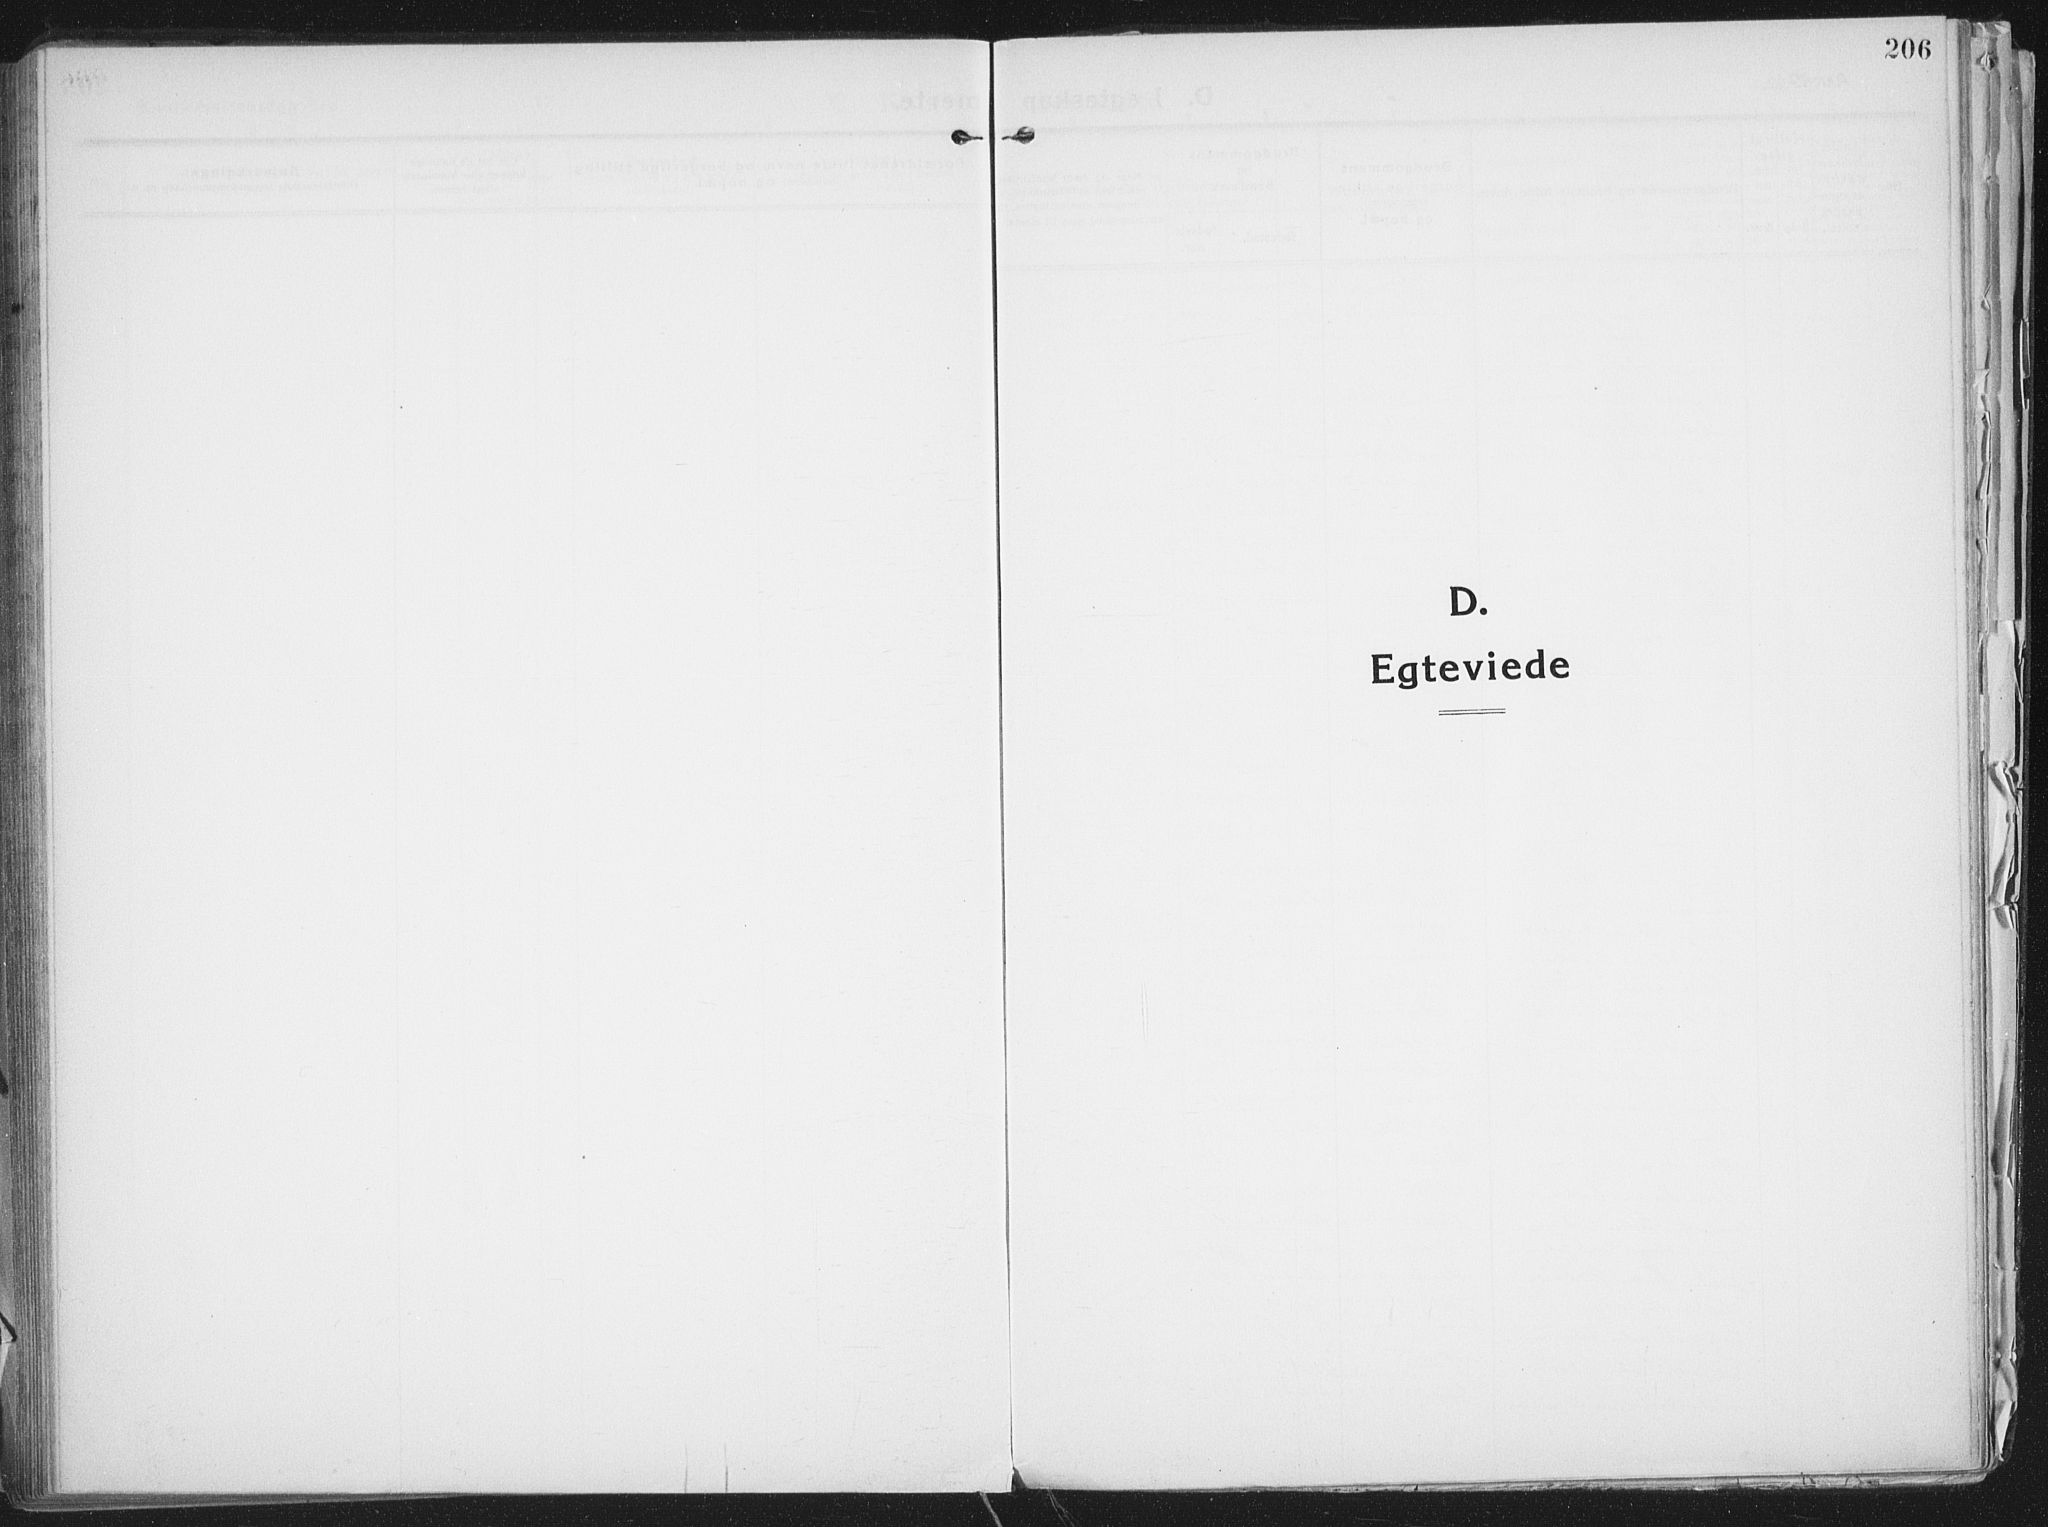 SATØ, Lenvik sokneprestembete, H/Ha: Ministerialbok nr. 16, 1910-1924, s. 206